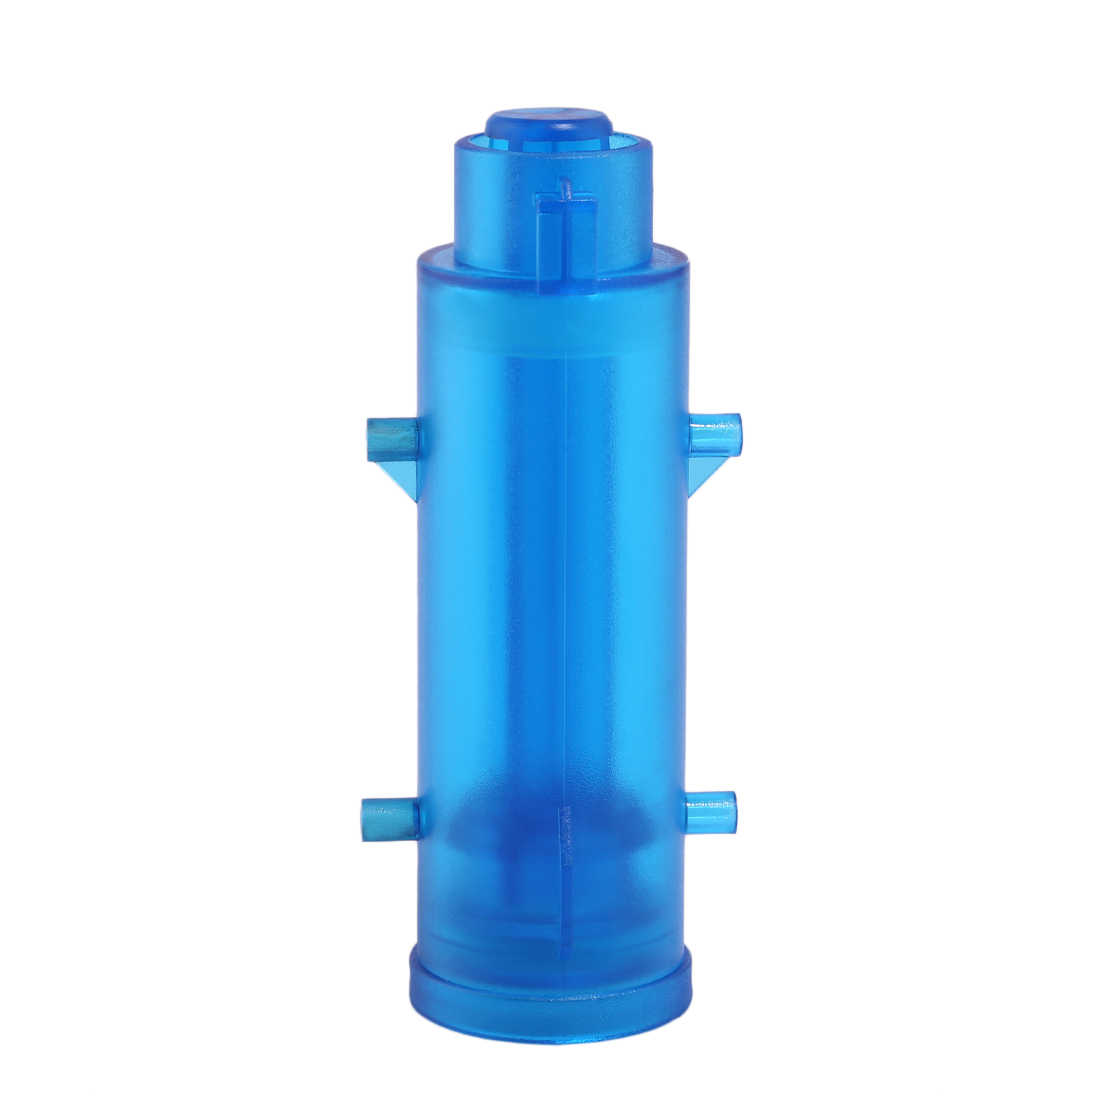 Nieuwe Hot Werknemer Retaliator Type-b Pomp Voor Werknemer Retaliator Shell Set Tou Pistool Onderdelen-Transparant Blauw